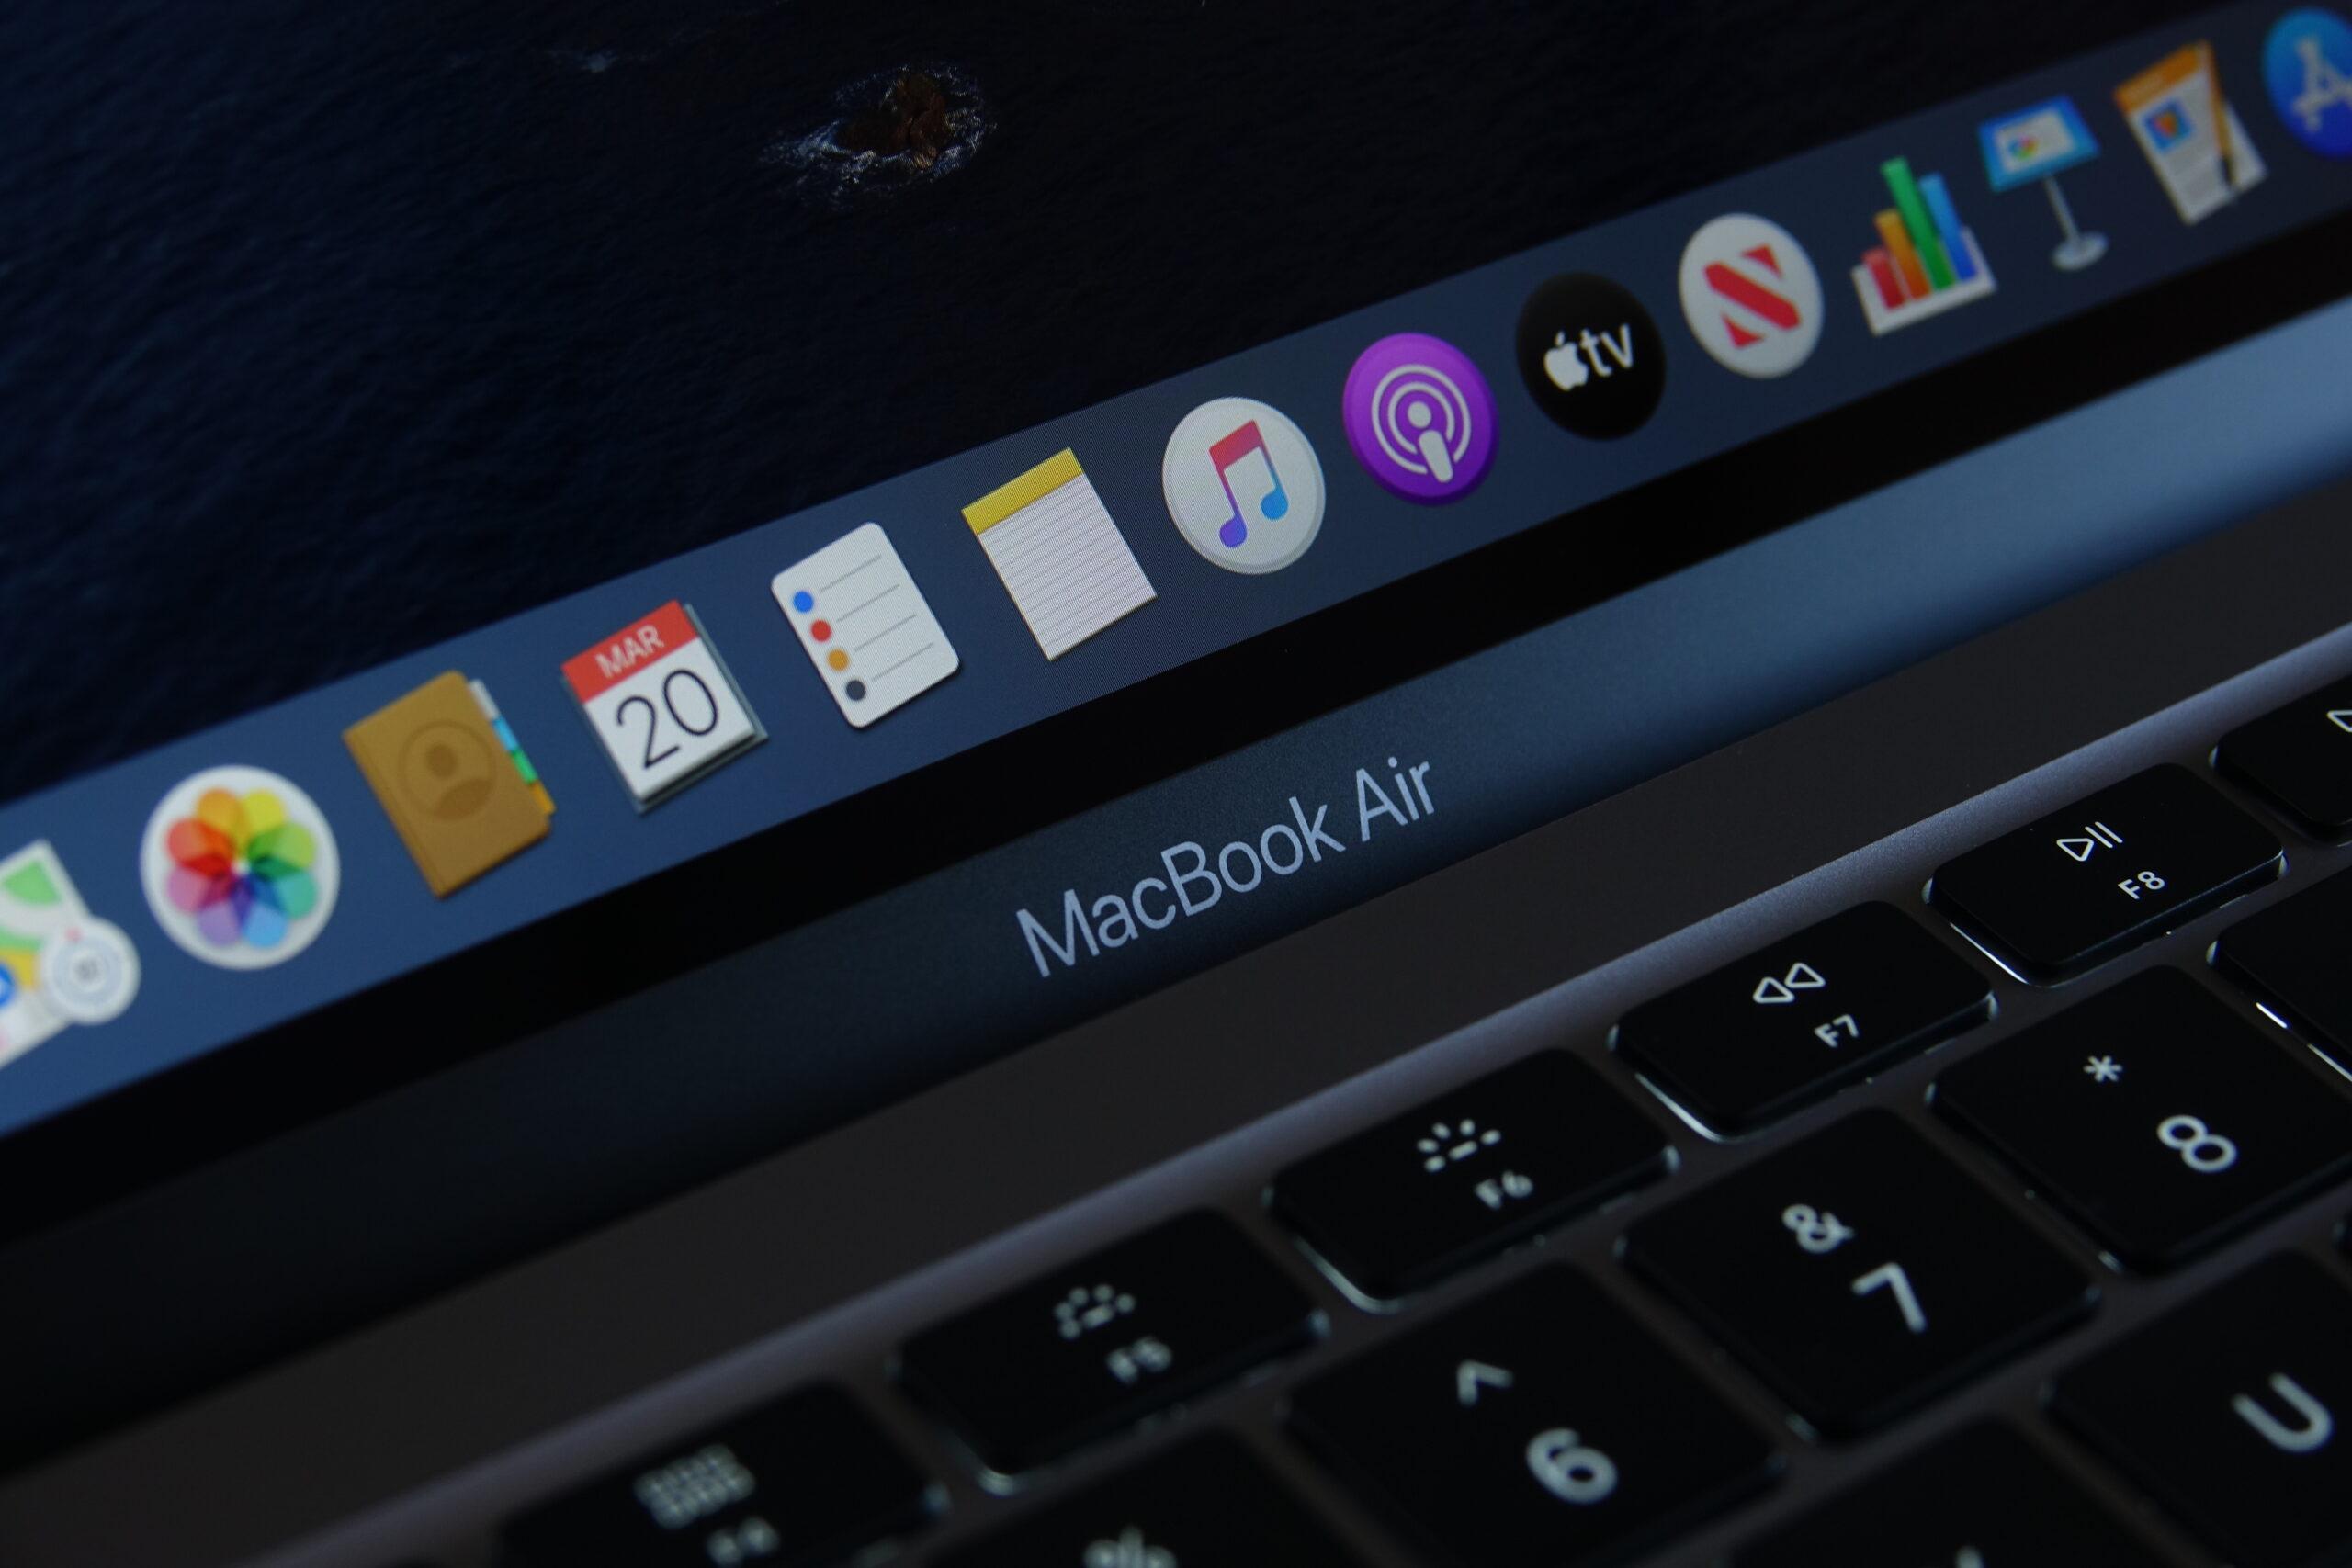 Macbook Air 2020 Price, Design, Keyboard, Display And ...